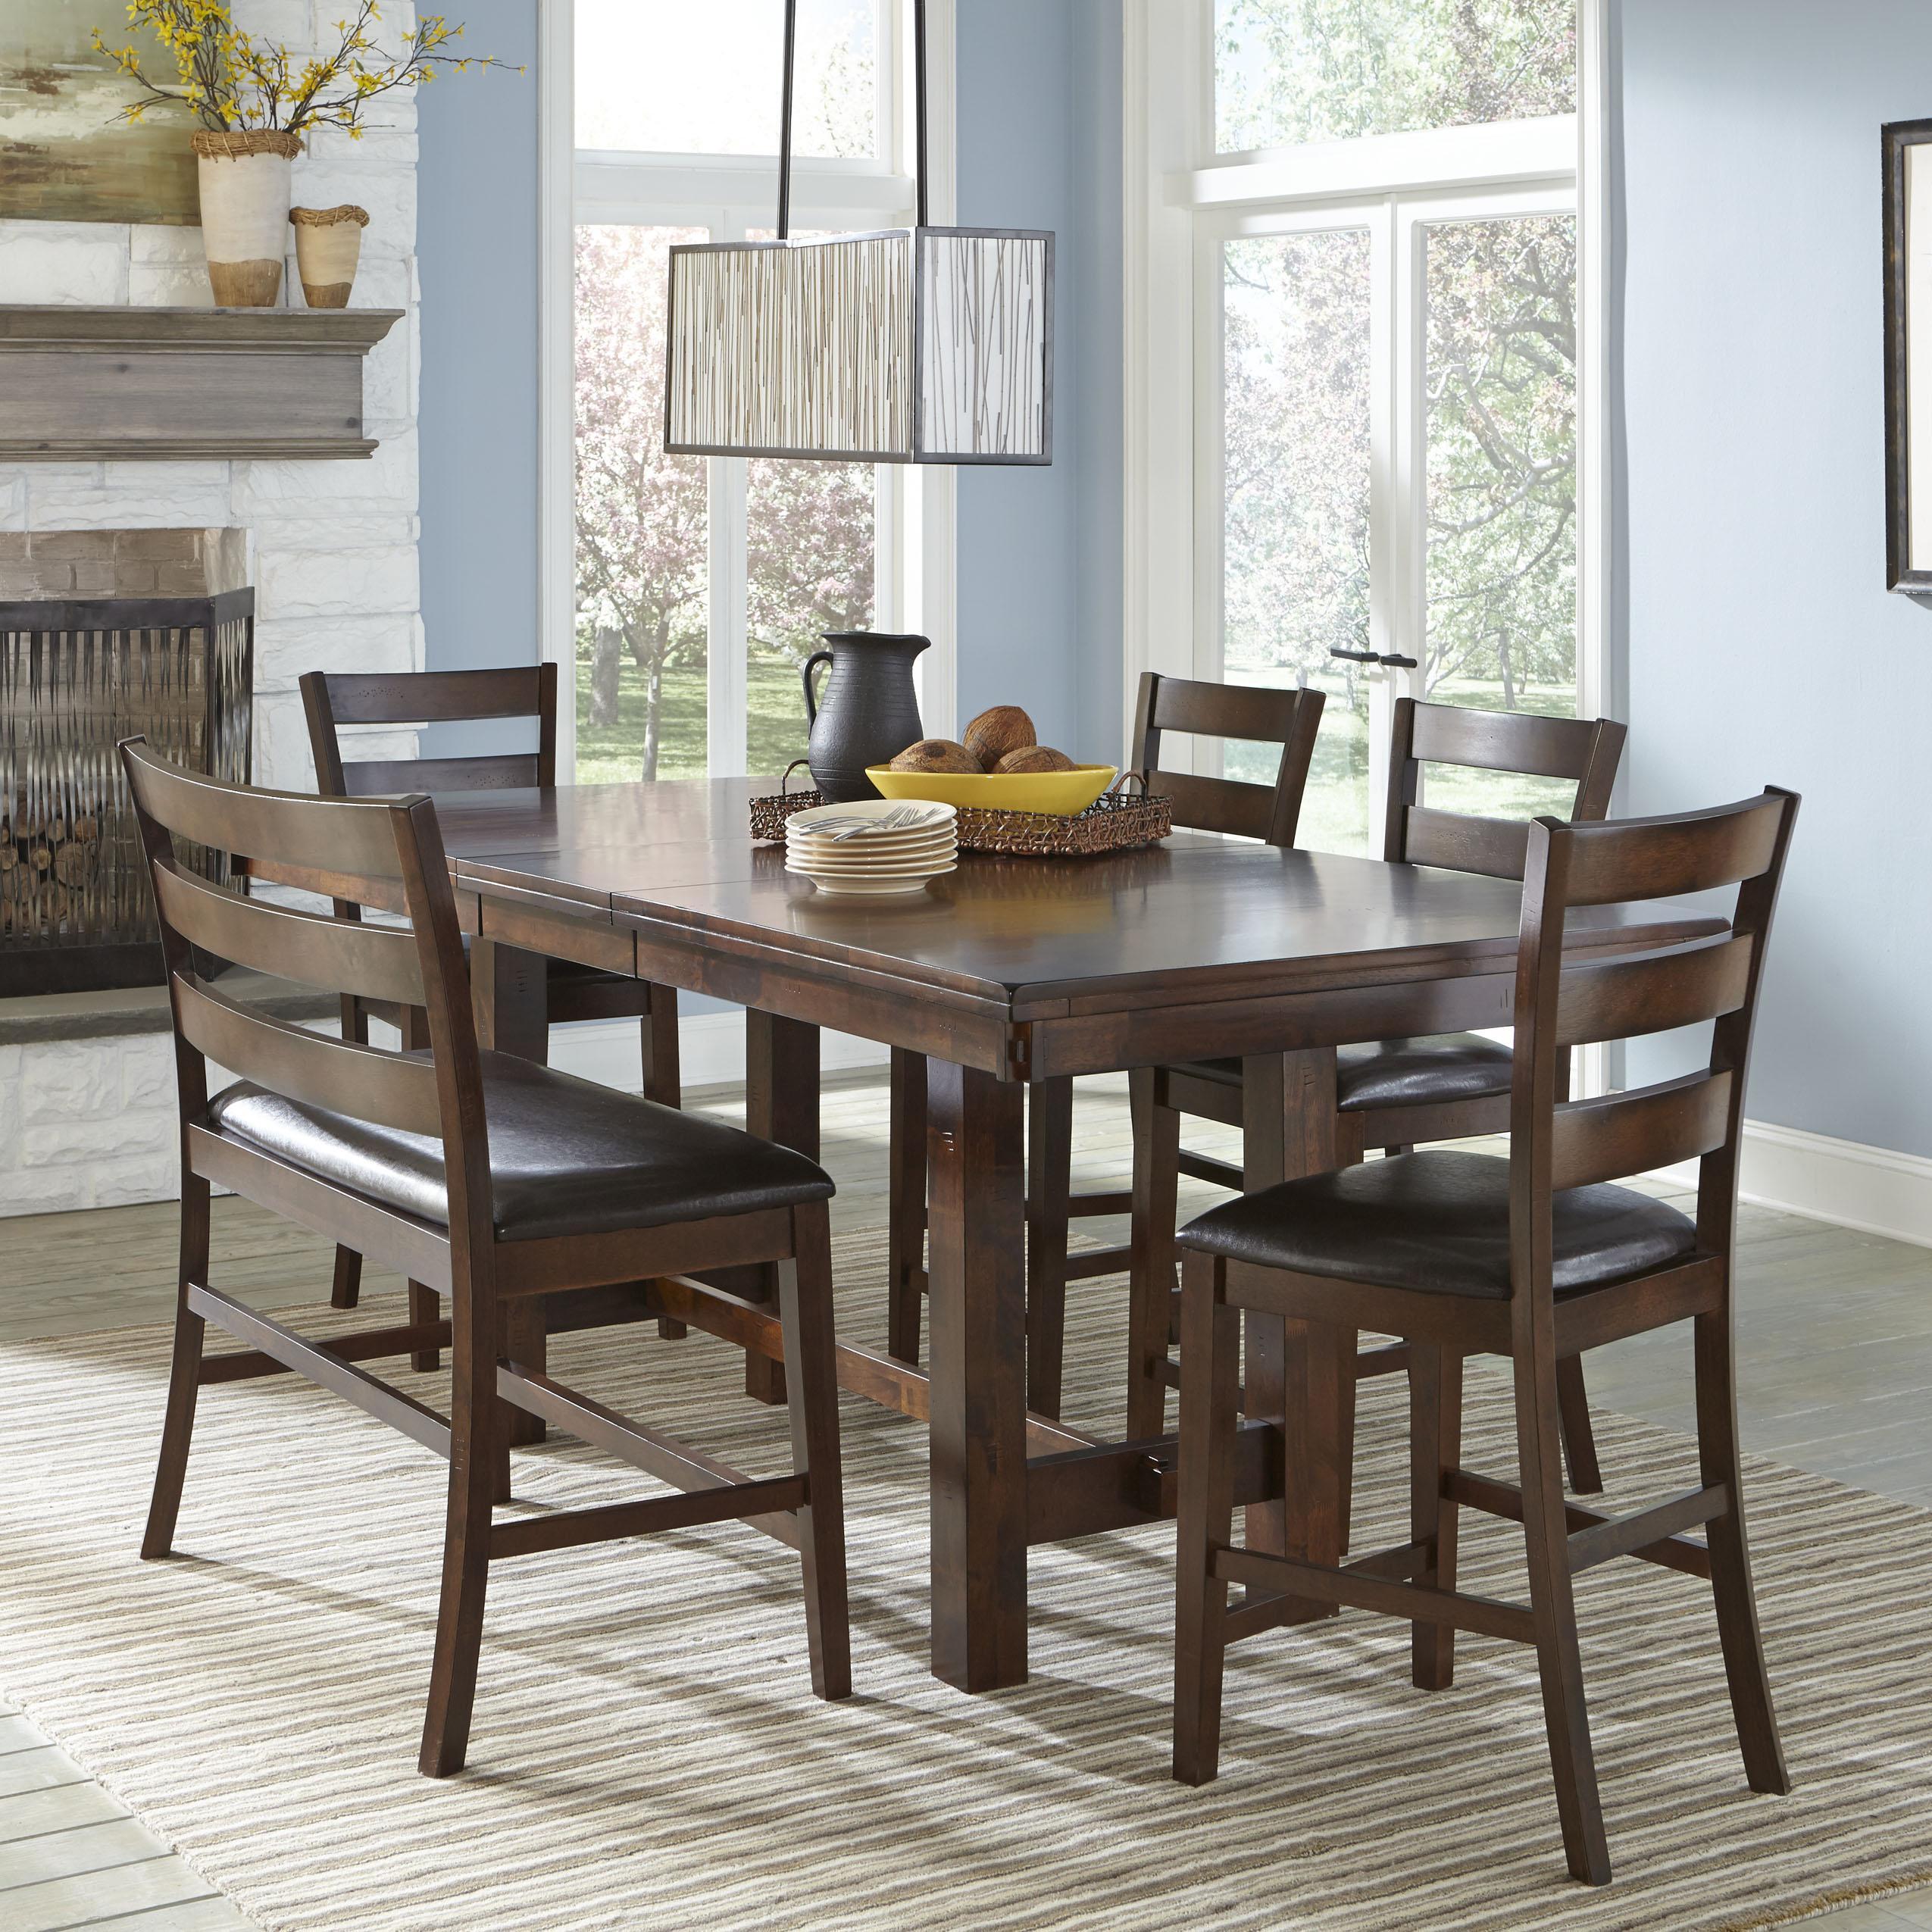 belfort select cabin creek counter height dining set with bench belfort furniture table. Black Bedroom Furniture Sets. Home Design Ideas